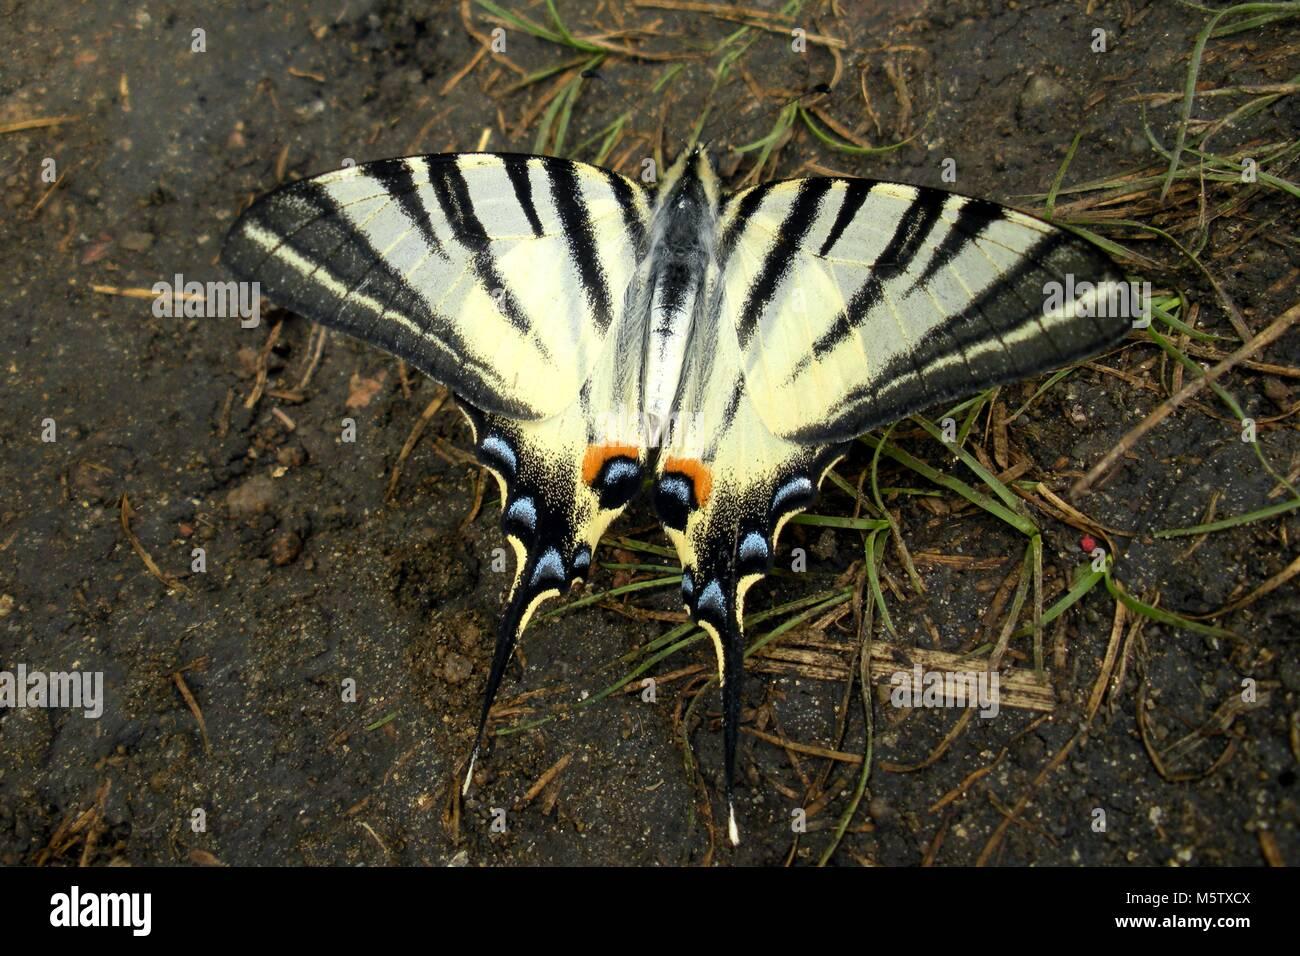 Sail swallowtail bytterfly. Stock Photo